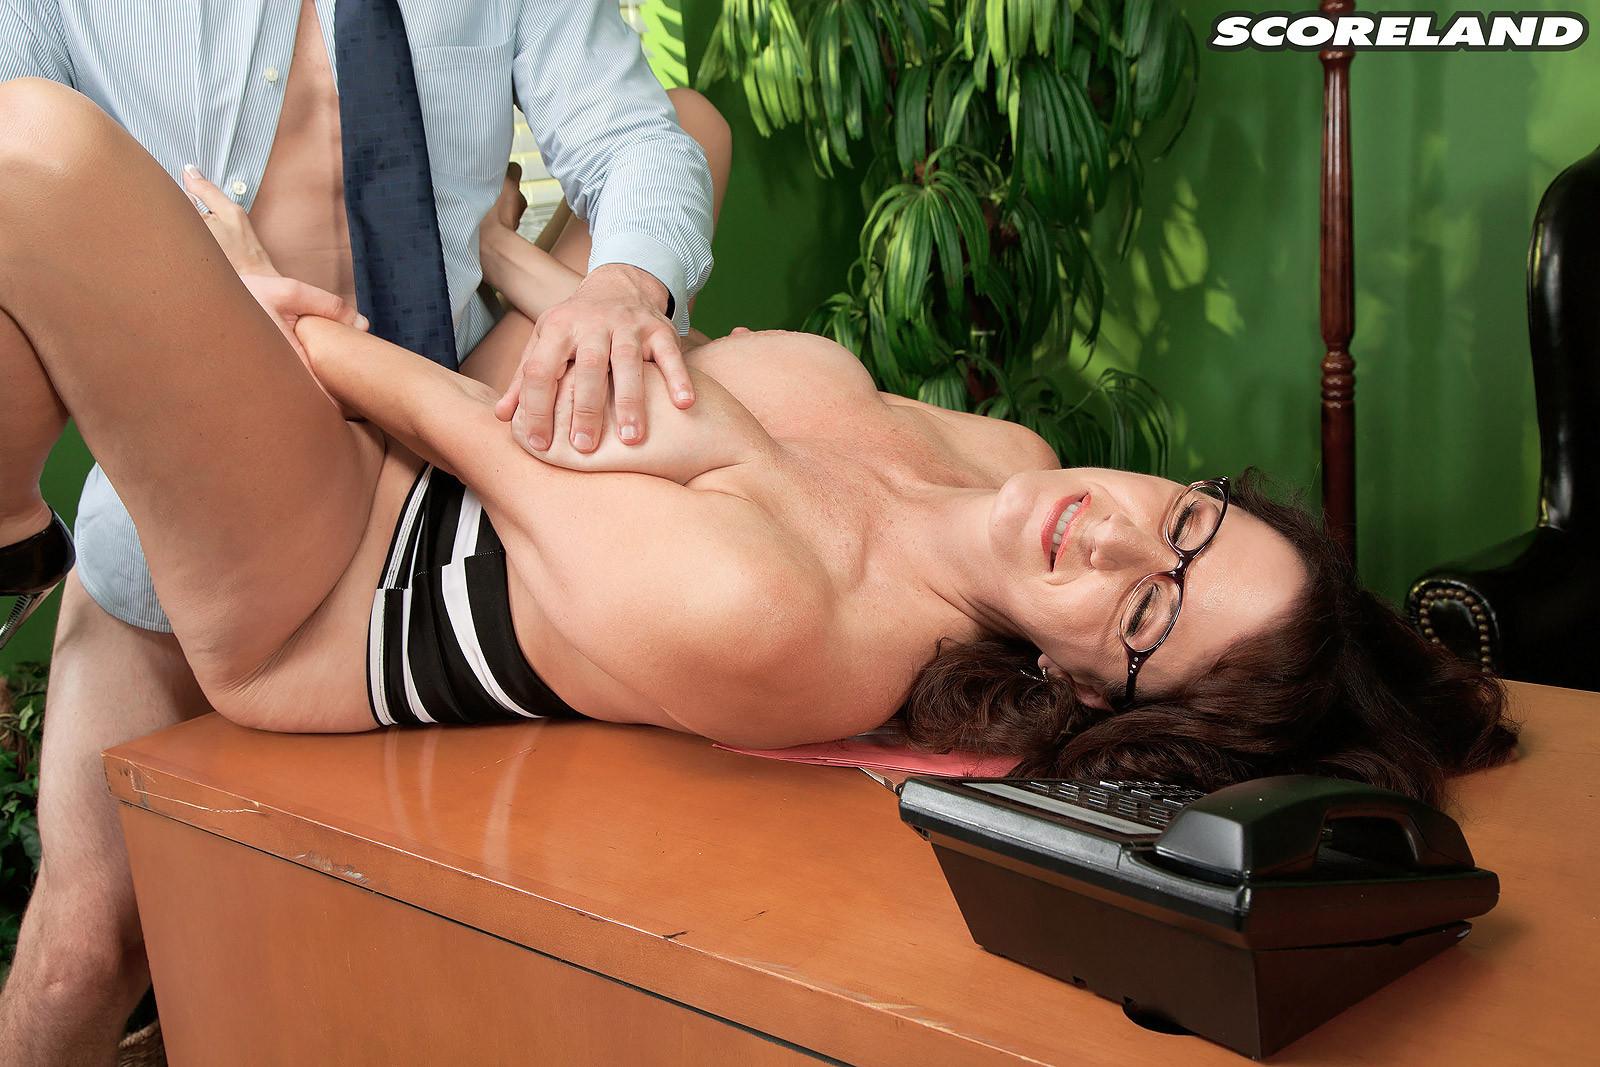 Scoreland secretary lunch hour cassie cougar